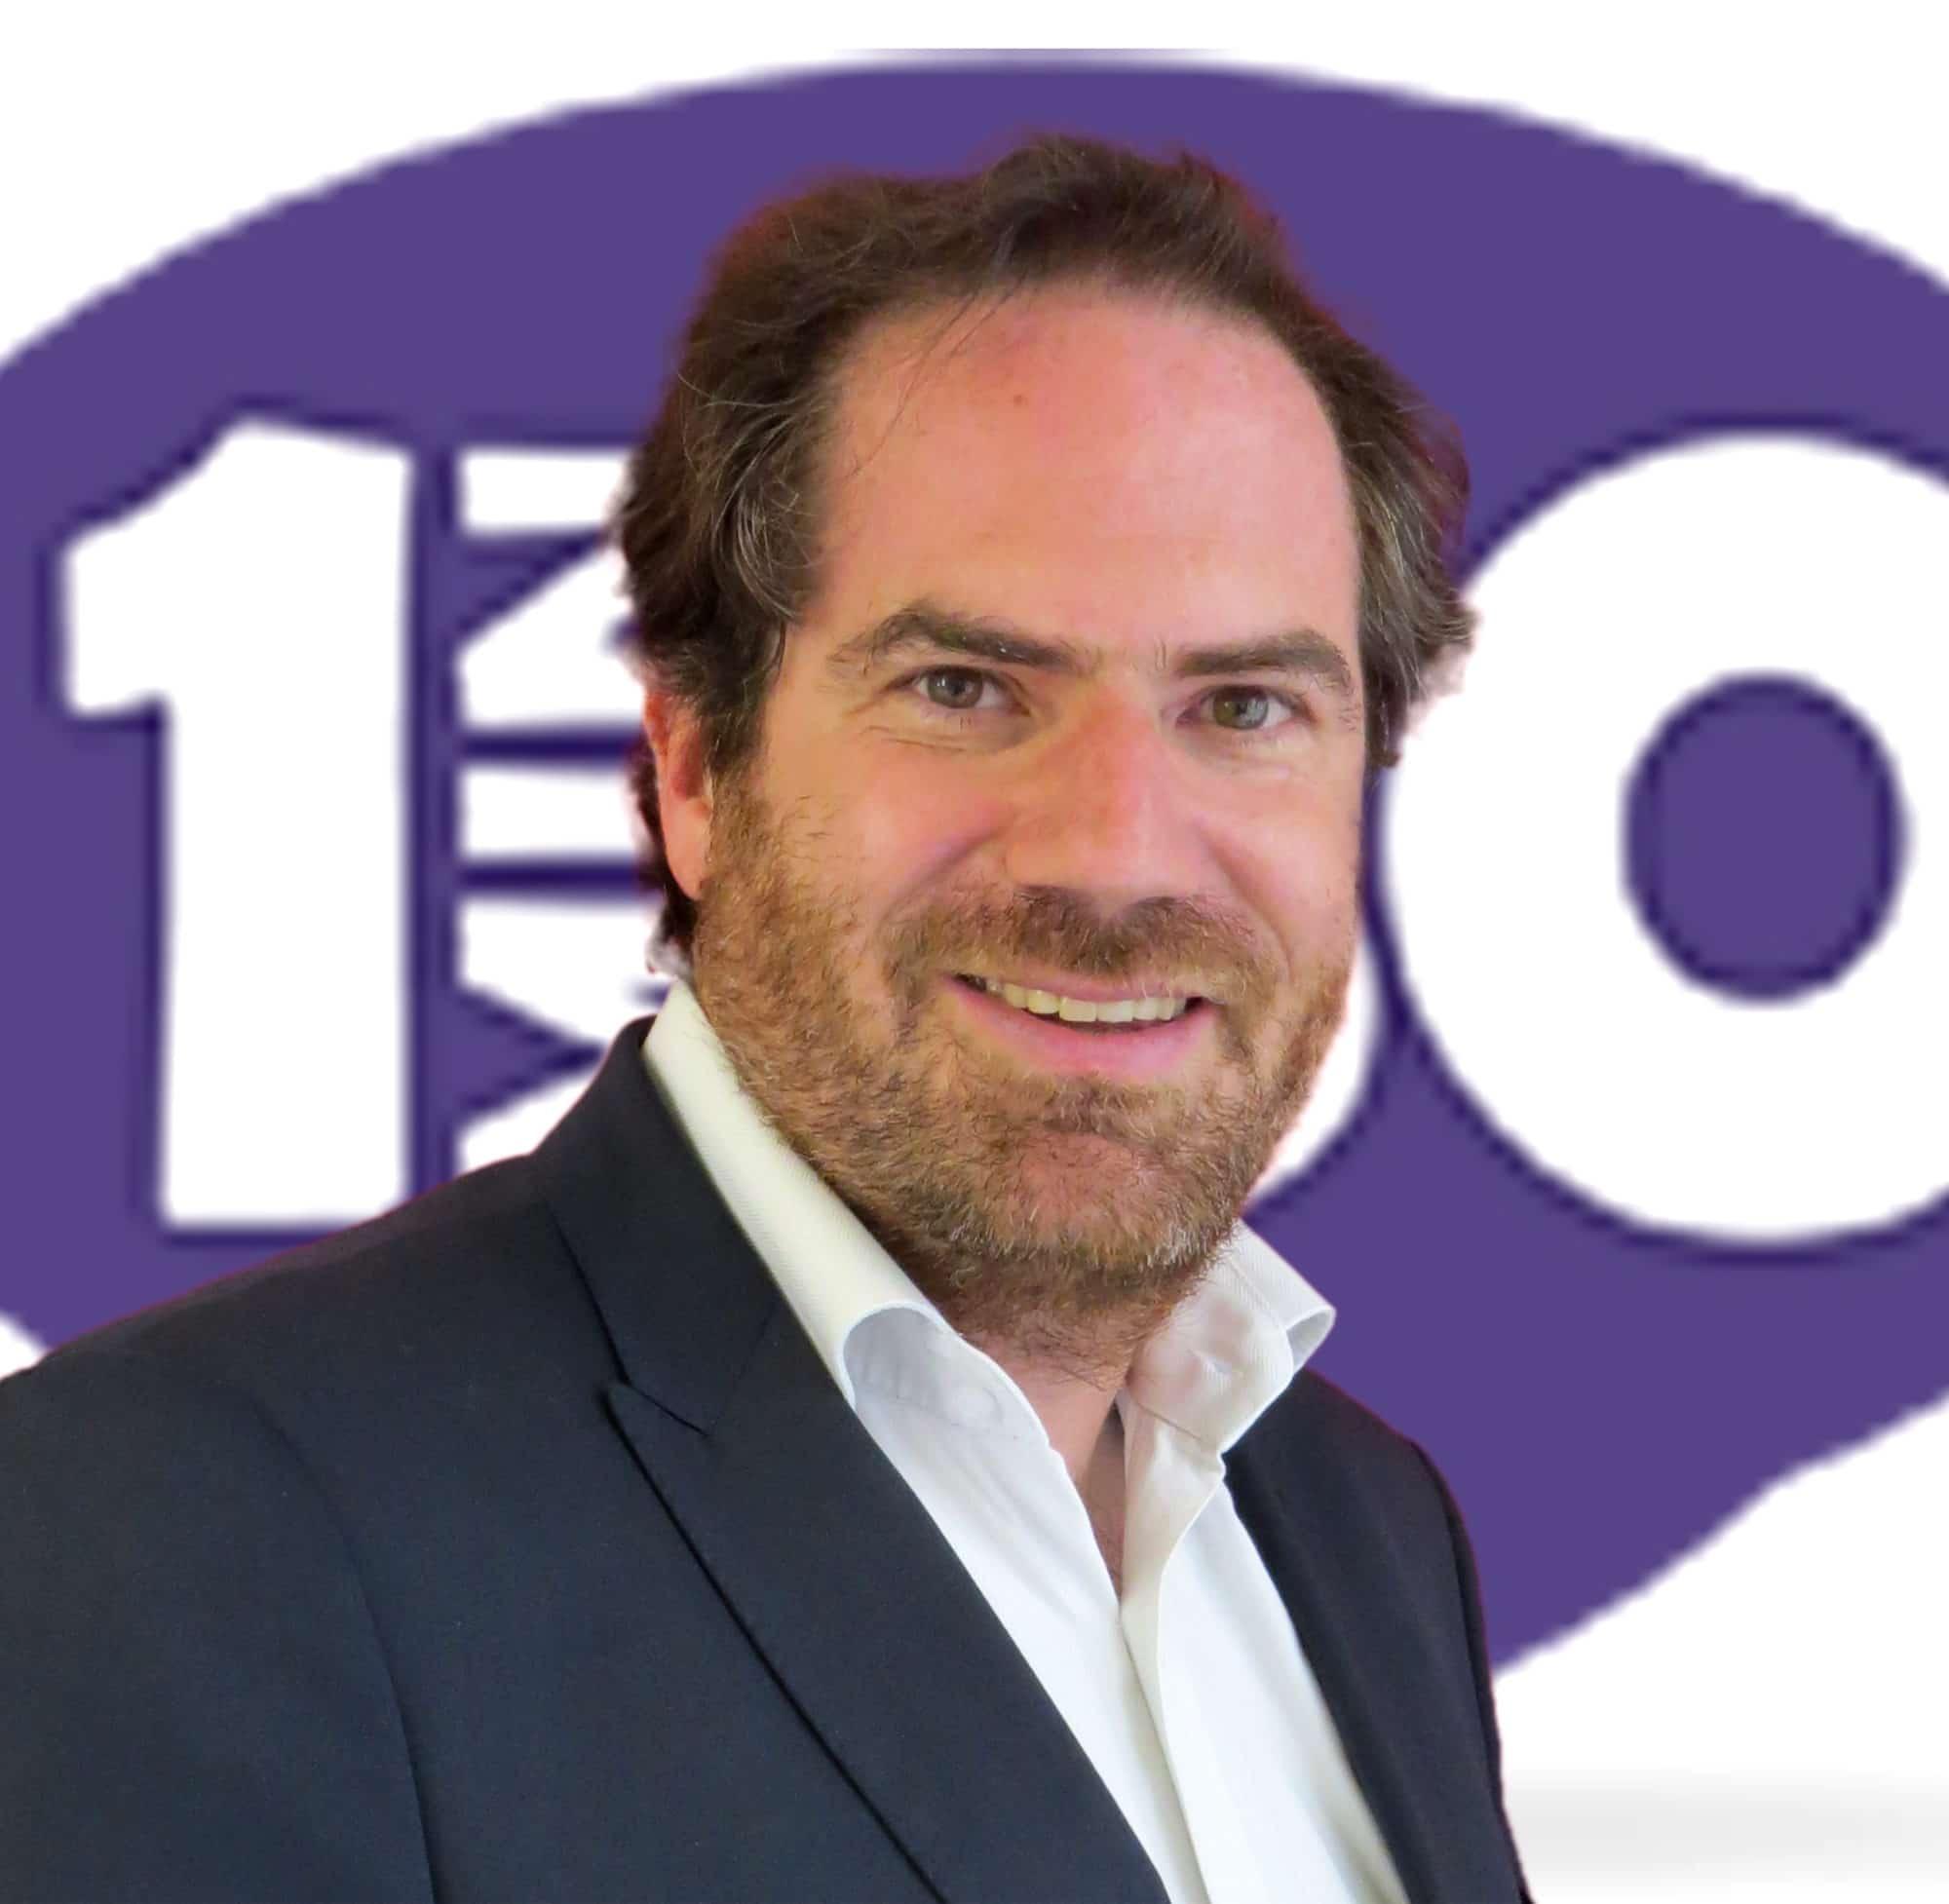 Gabriel Dabi-Schwebel, fondateur de l'agence web et marketing 1min30. - 1min30